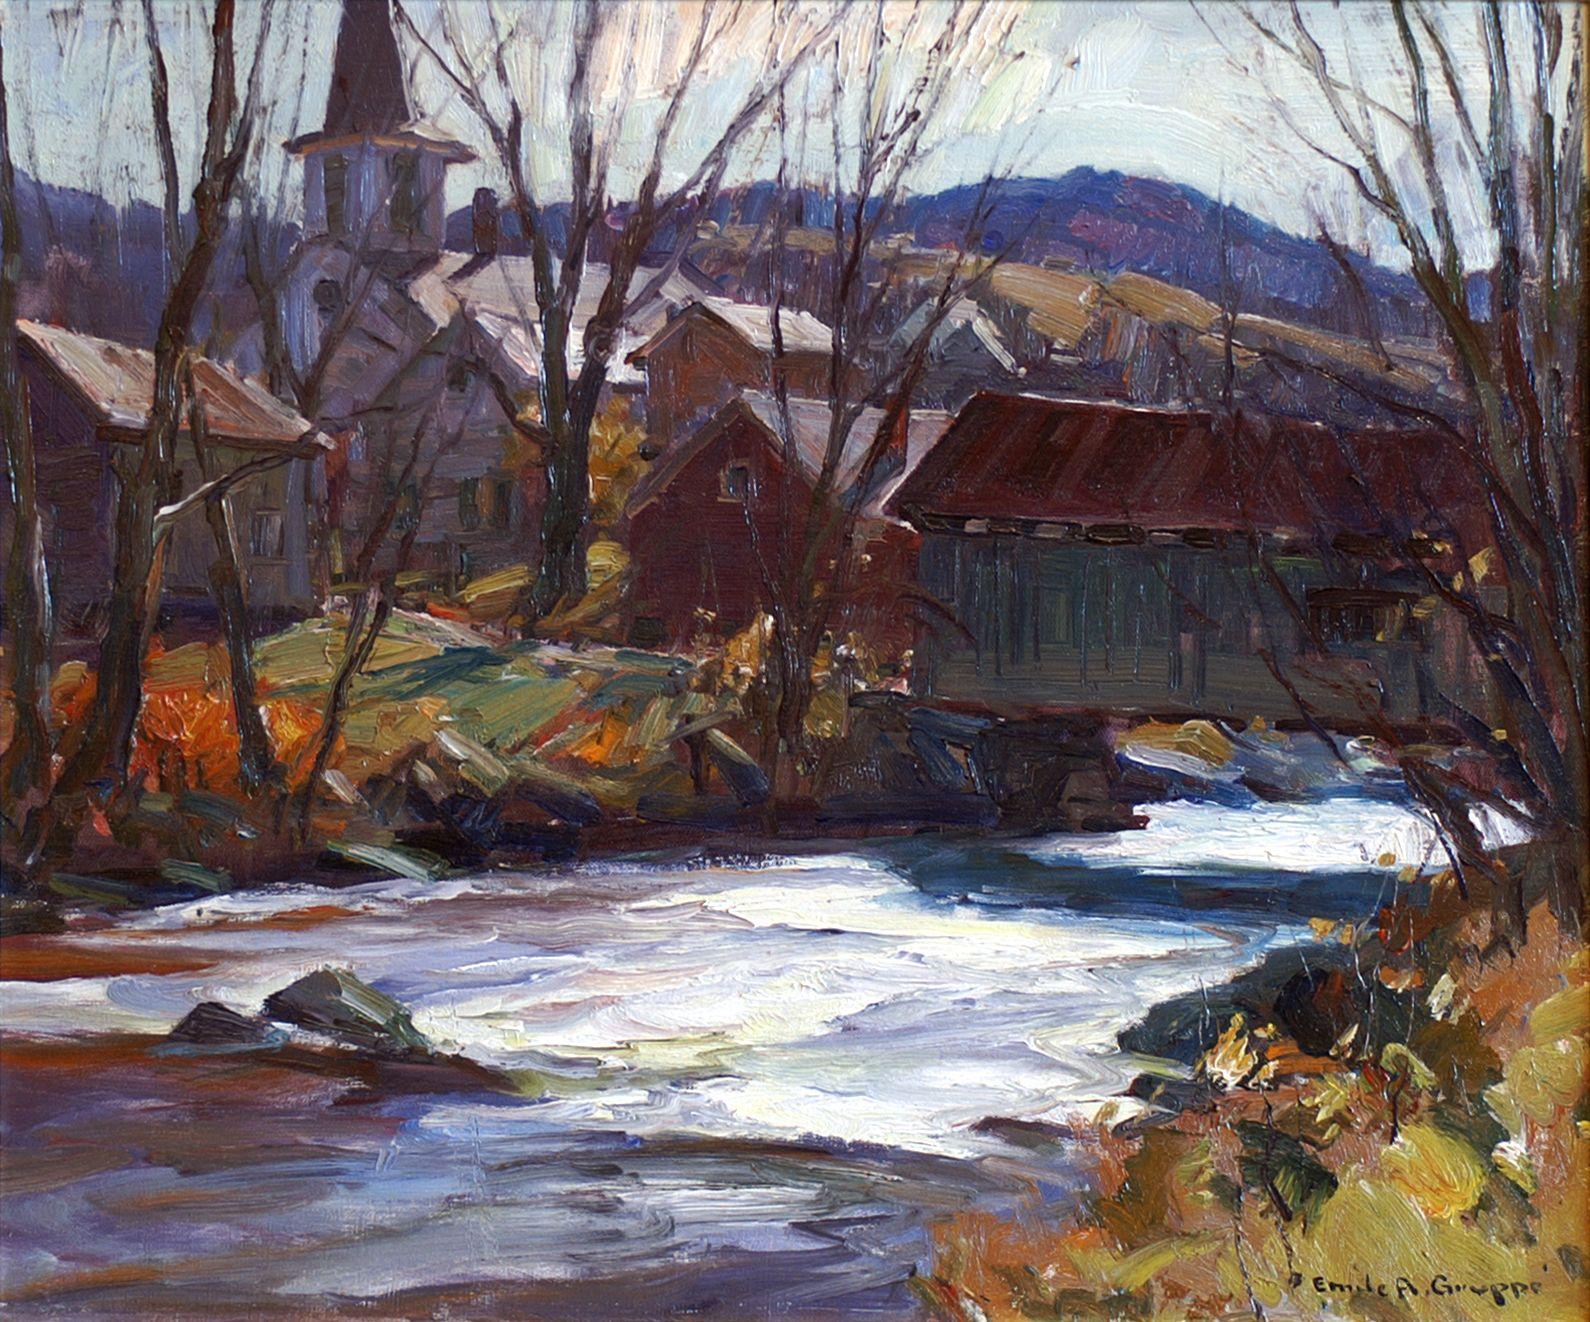 Emile Gruppe Trout Stream Waterville Vermont 1967